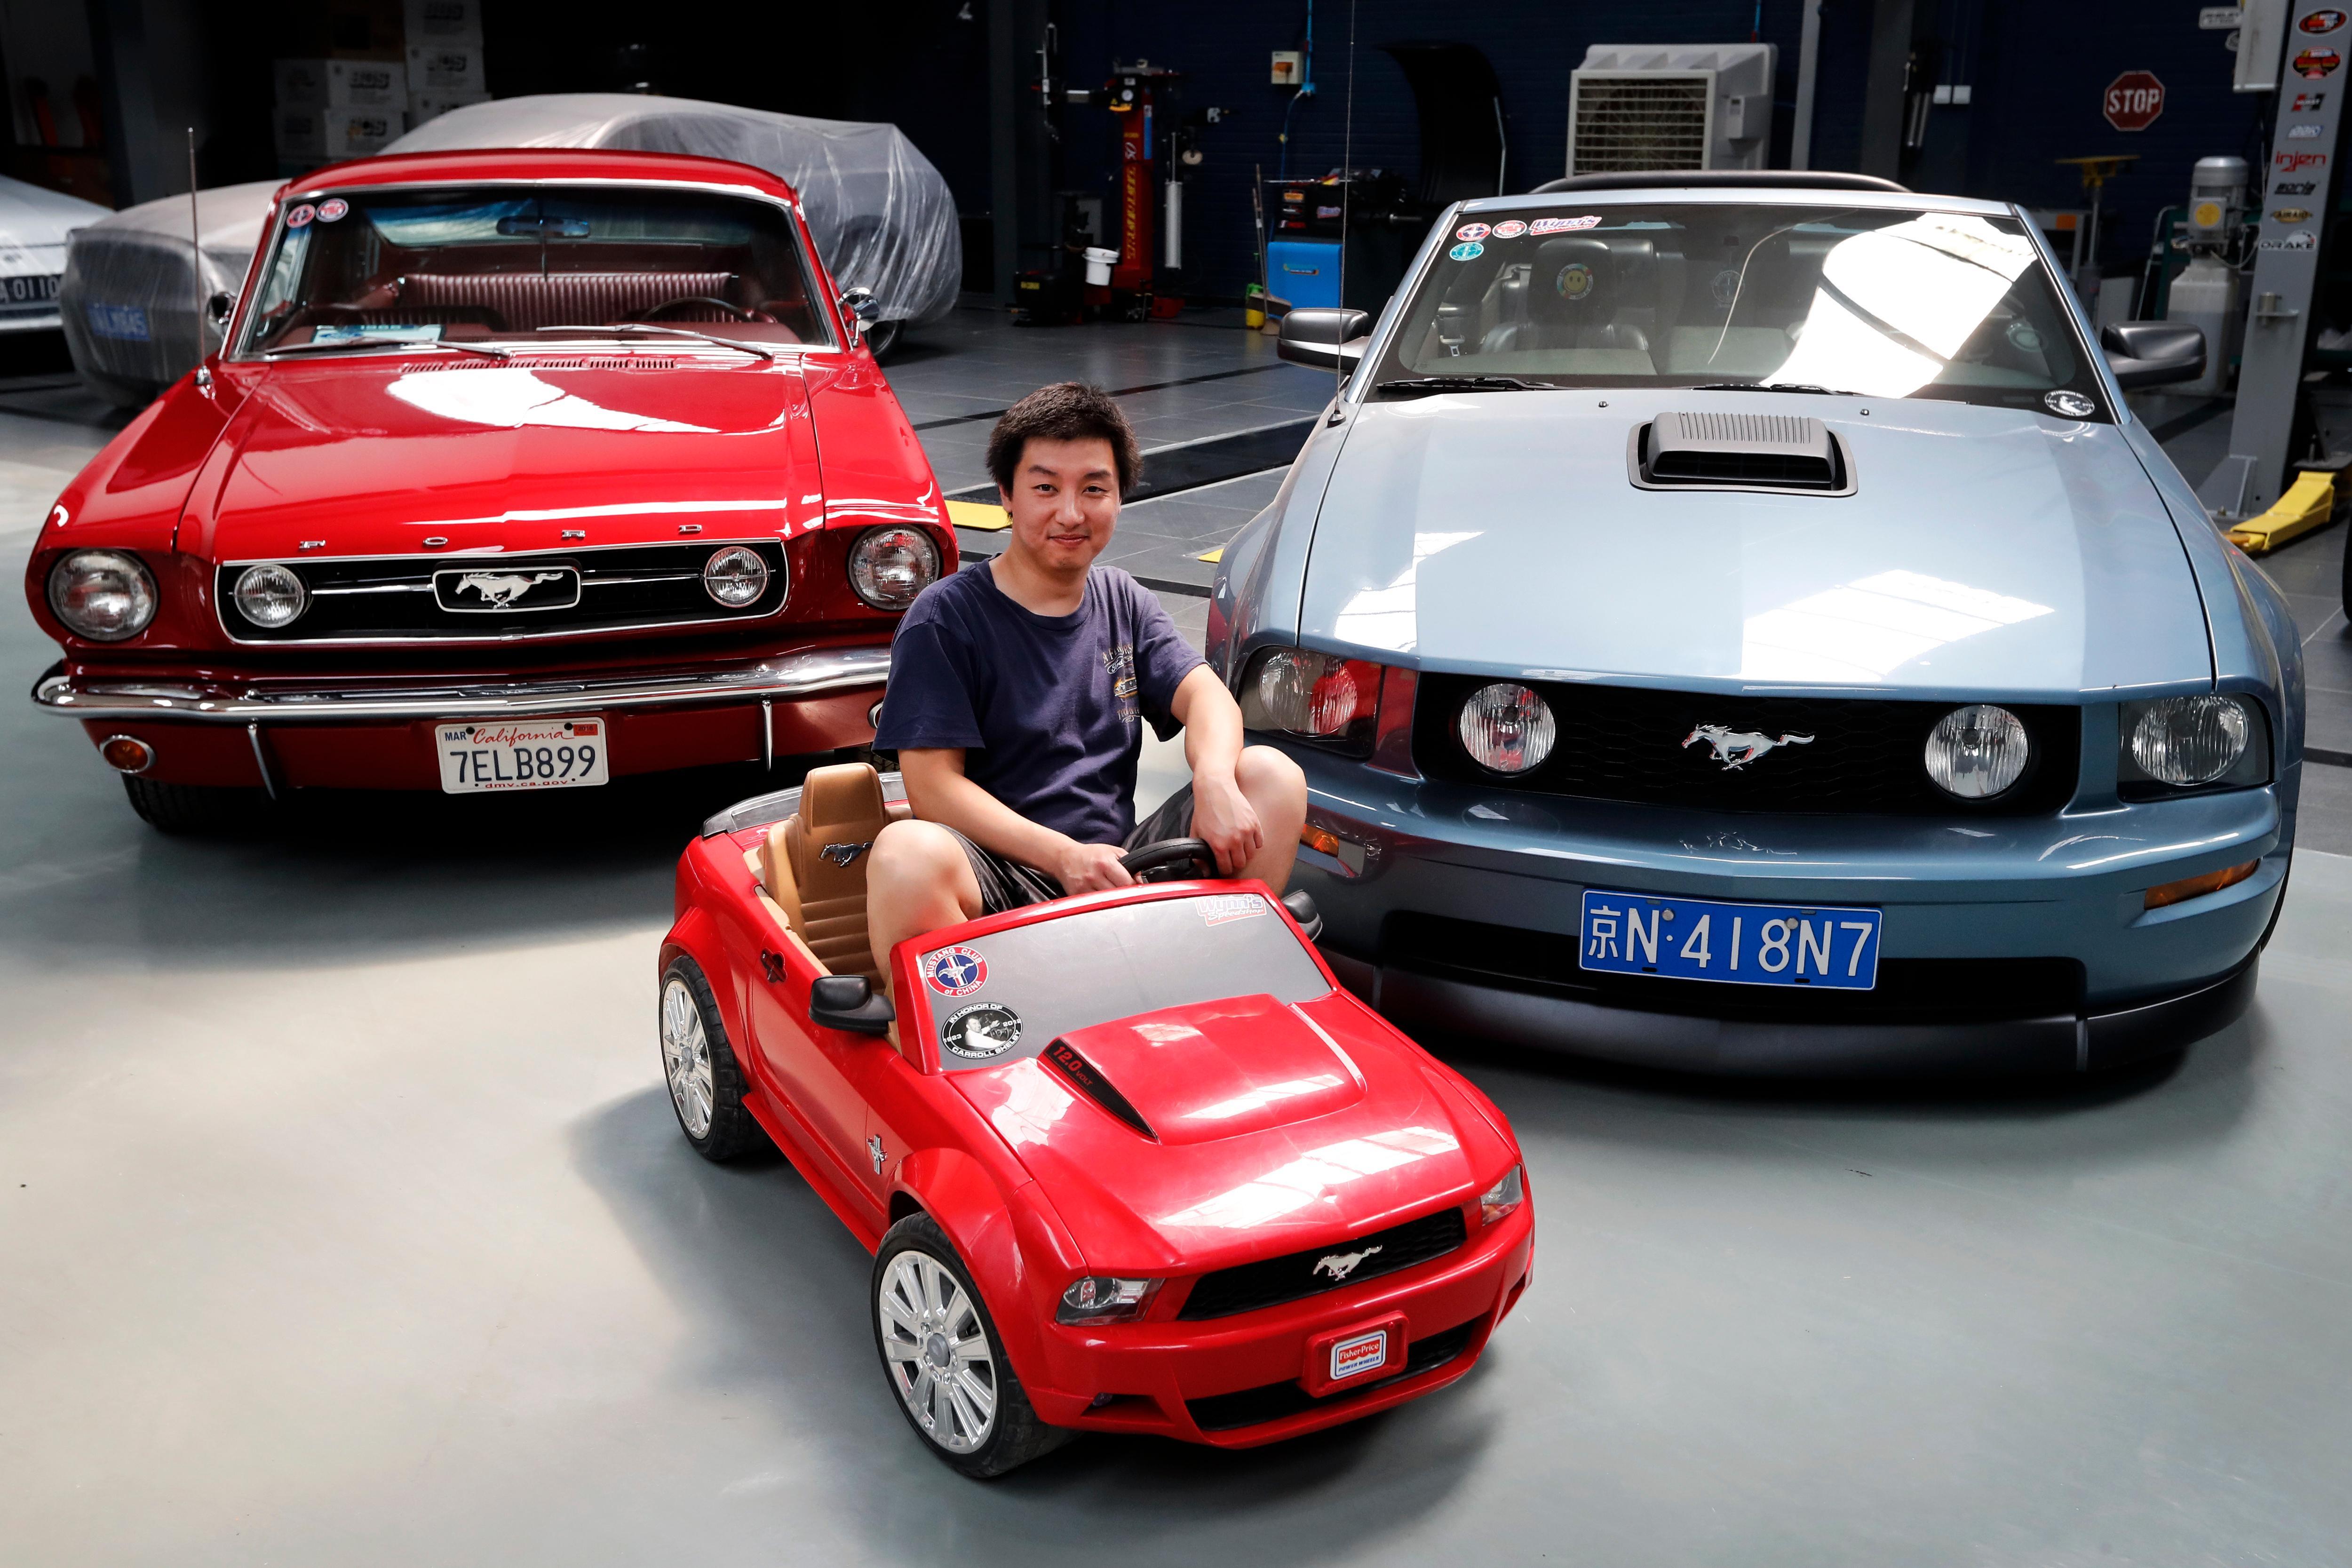 Demand overseas keeps Mustang on top despite lower US sales | WUCW